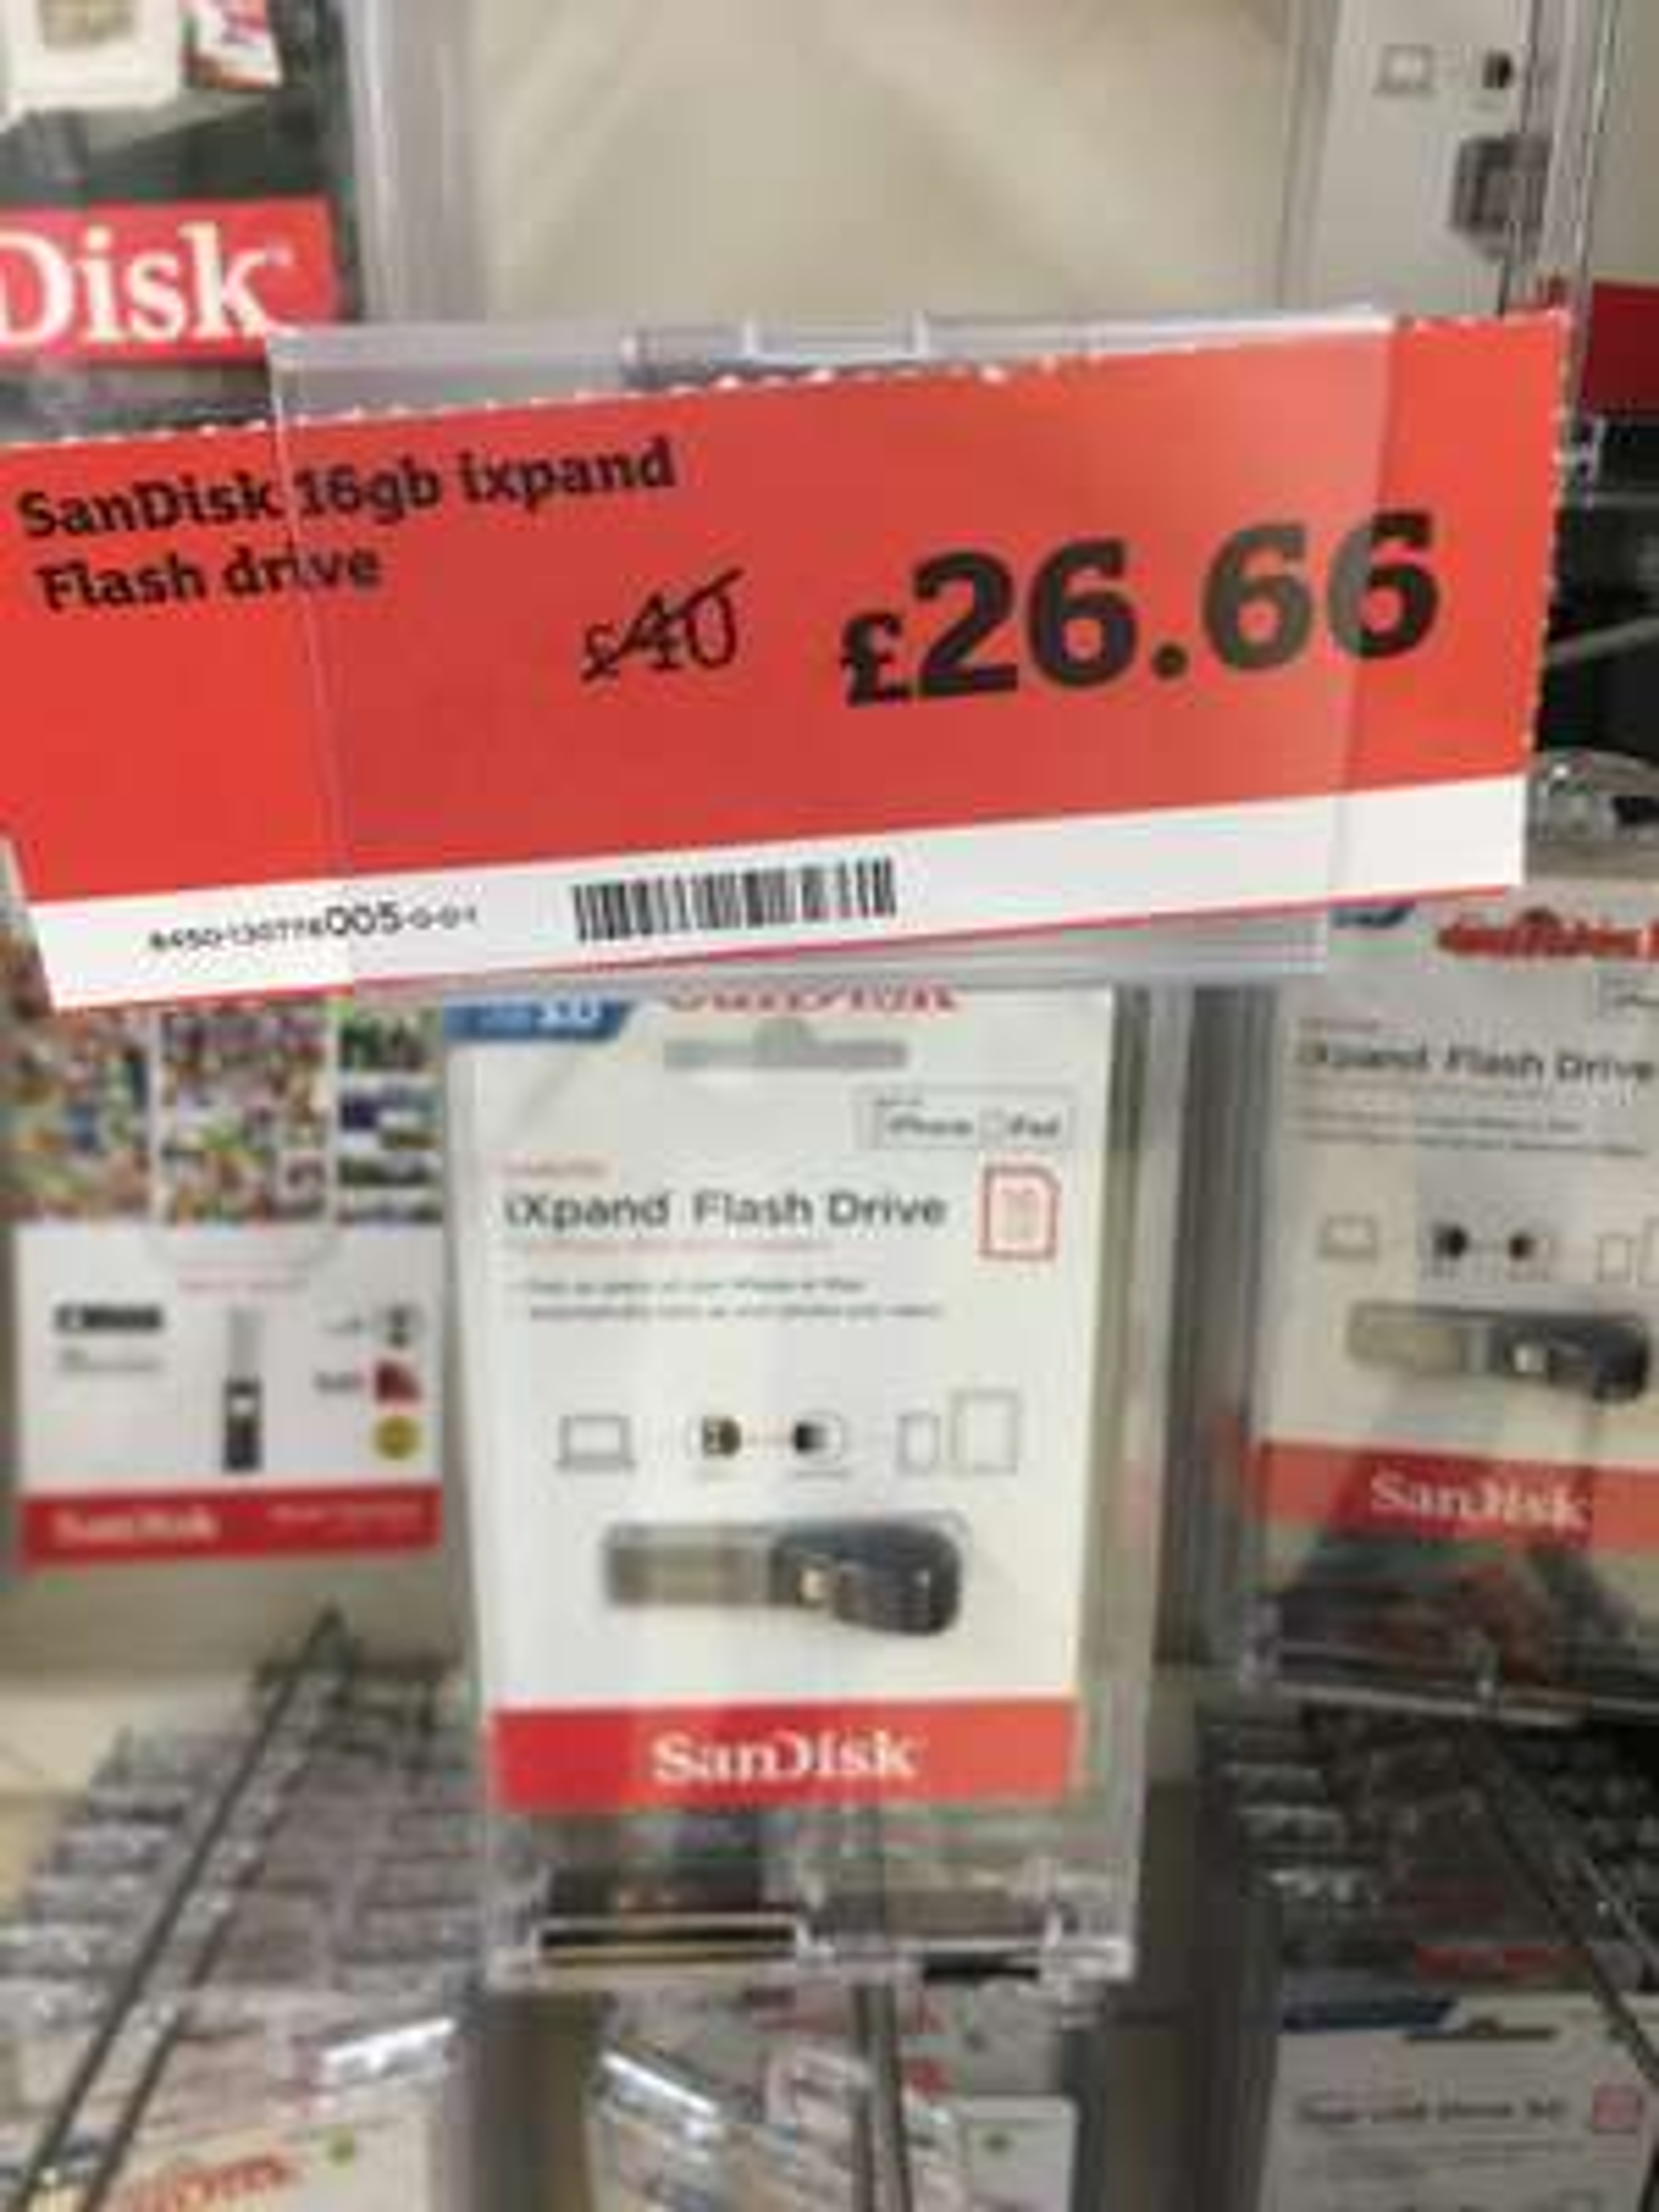 Sandisk Ixpand 16GB £26.66 @ Sainsbury's